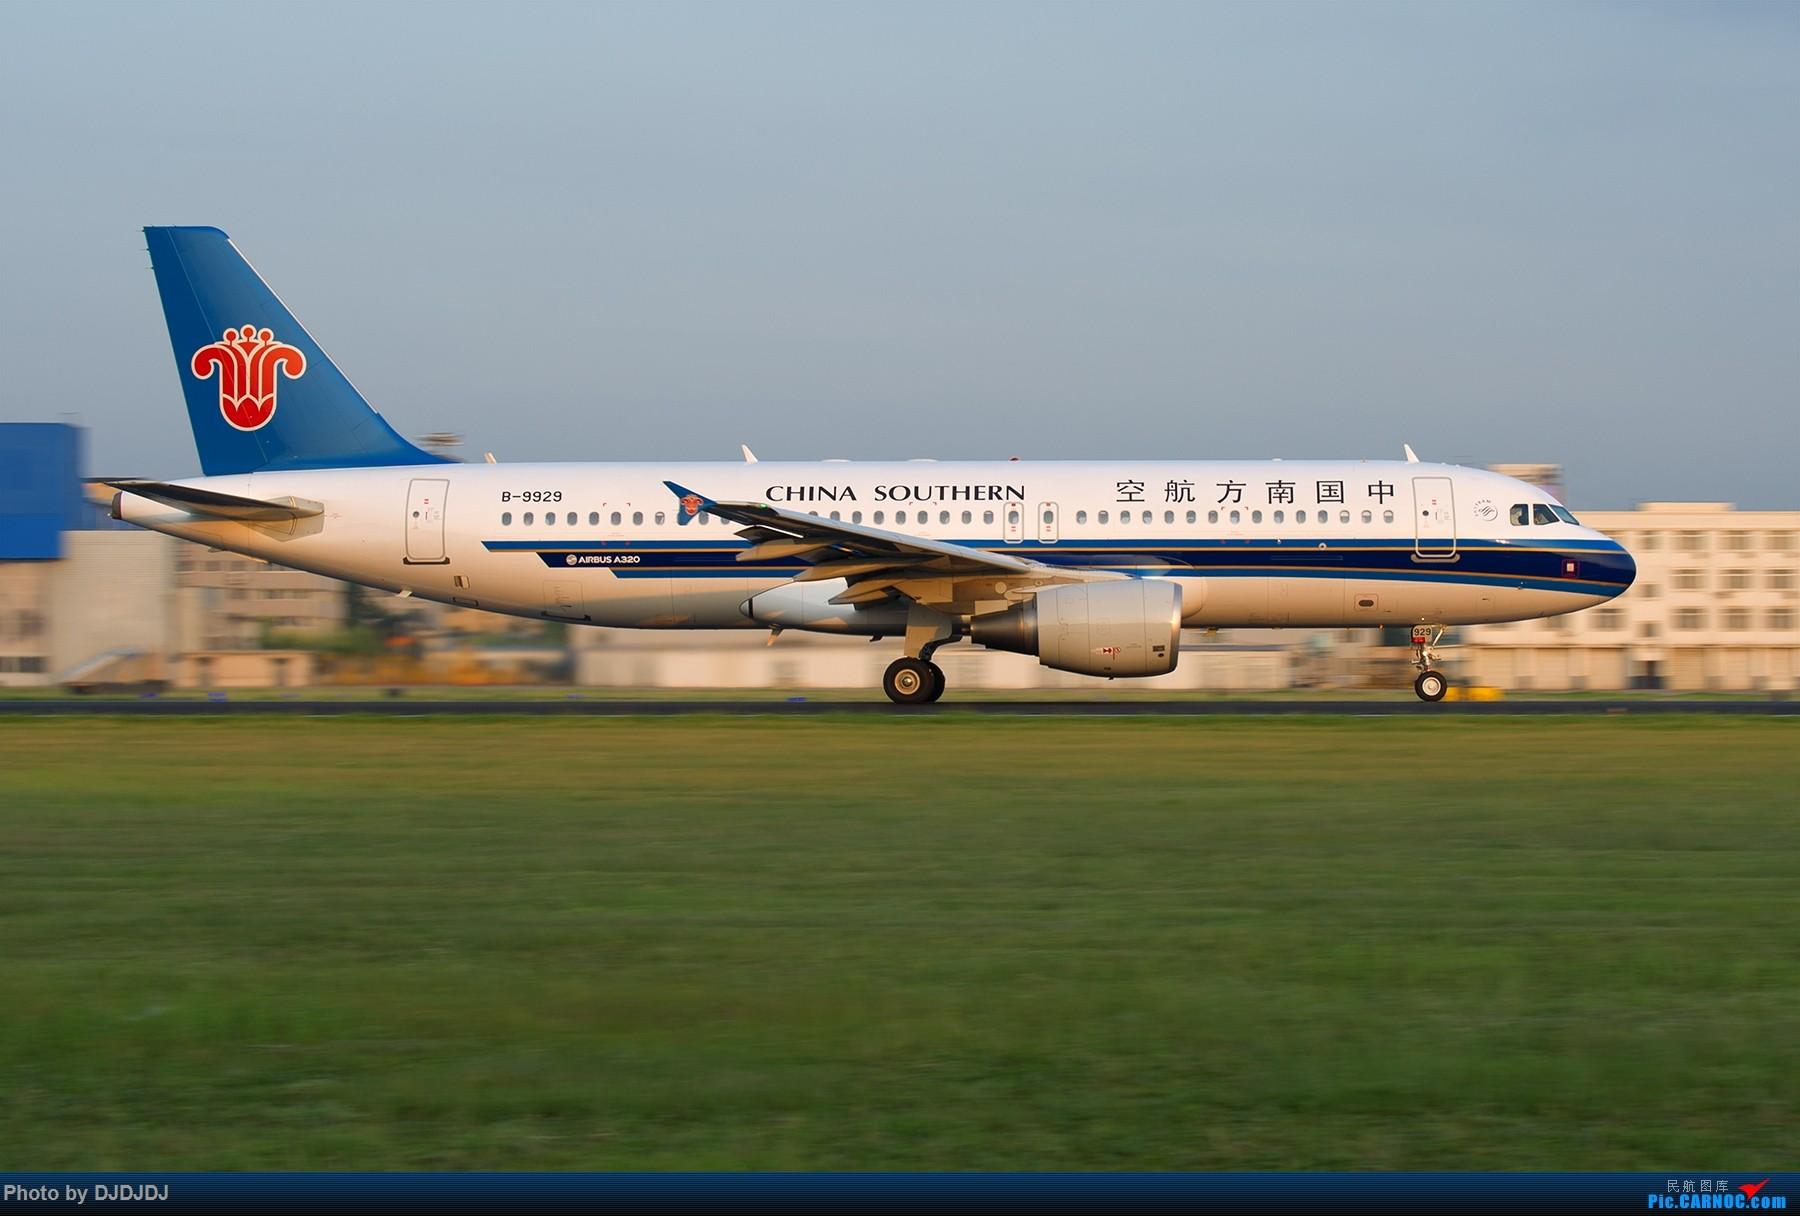 Re:[原创]【BLDDQ--深圳打机队】沈阳好温暖--想念北方的花 AIRBUS A320-200 B-9929 中国沈阳桃仙国际机场